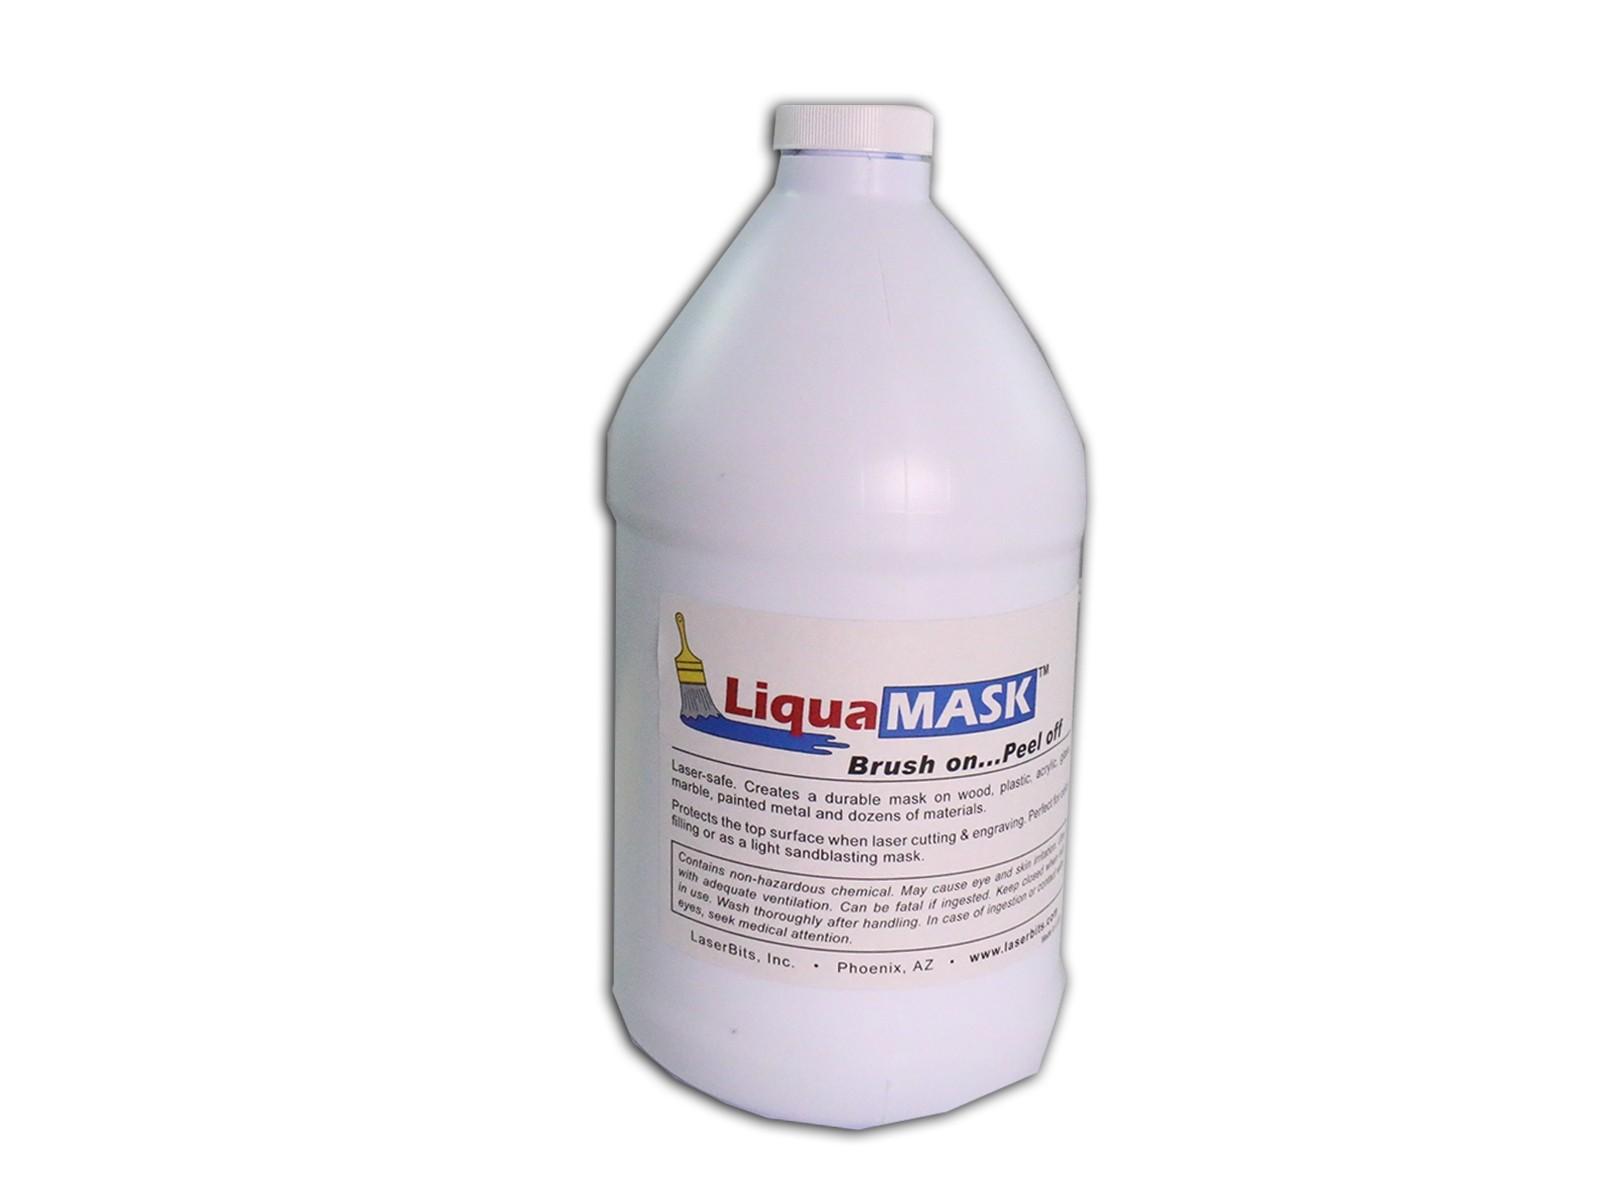 LiquaMask - Half Gallon